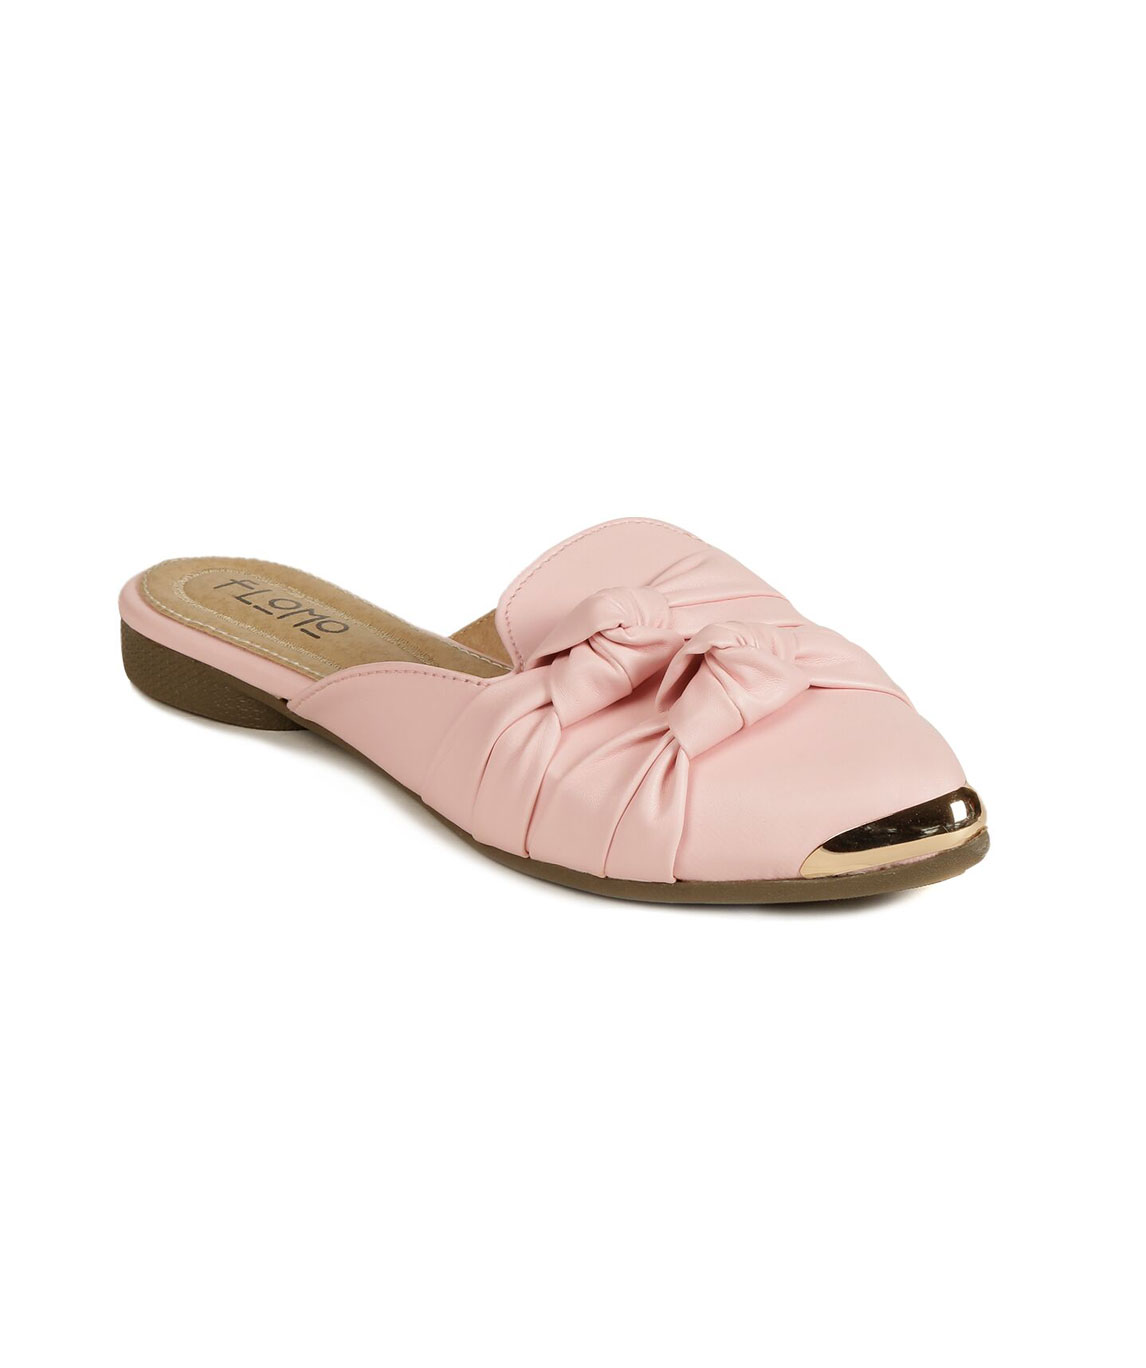 Flomo Women`s Pink Resin Casual Mules